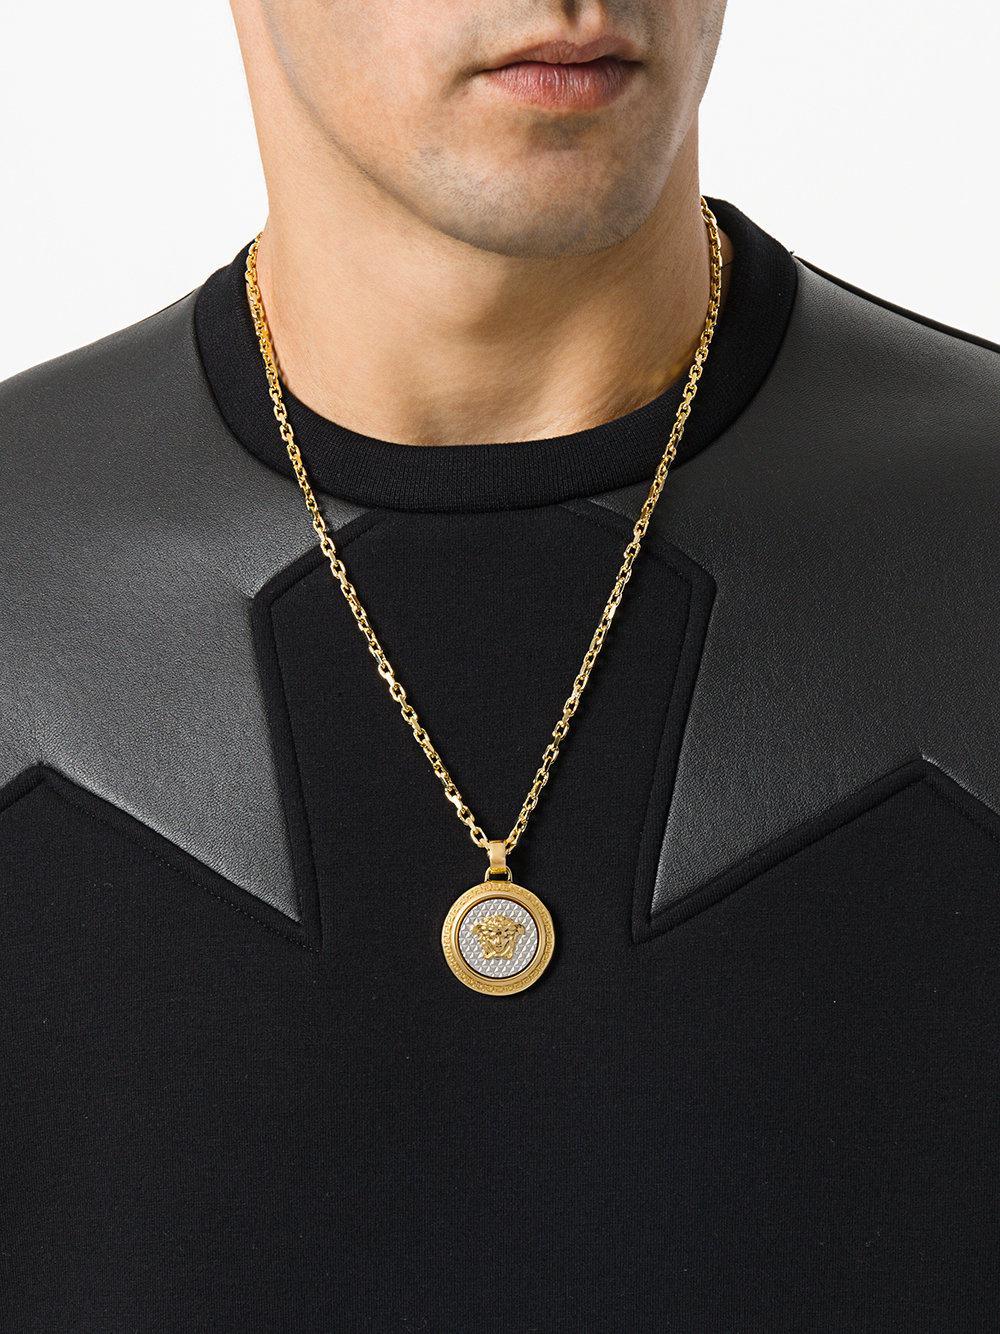 eb0cfeeeb6fa75 Versace Medusa Pendant Necklace in Metallic for Men - Lyst